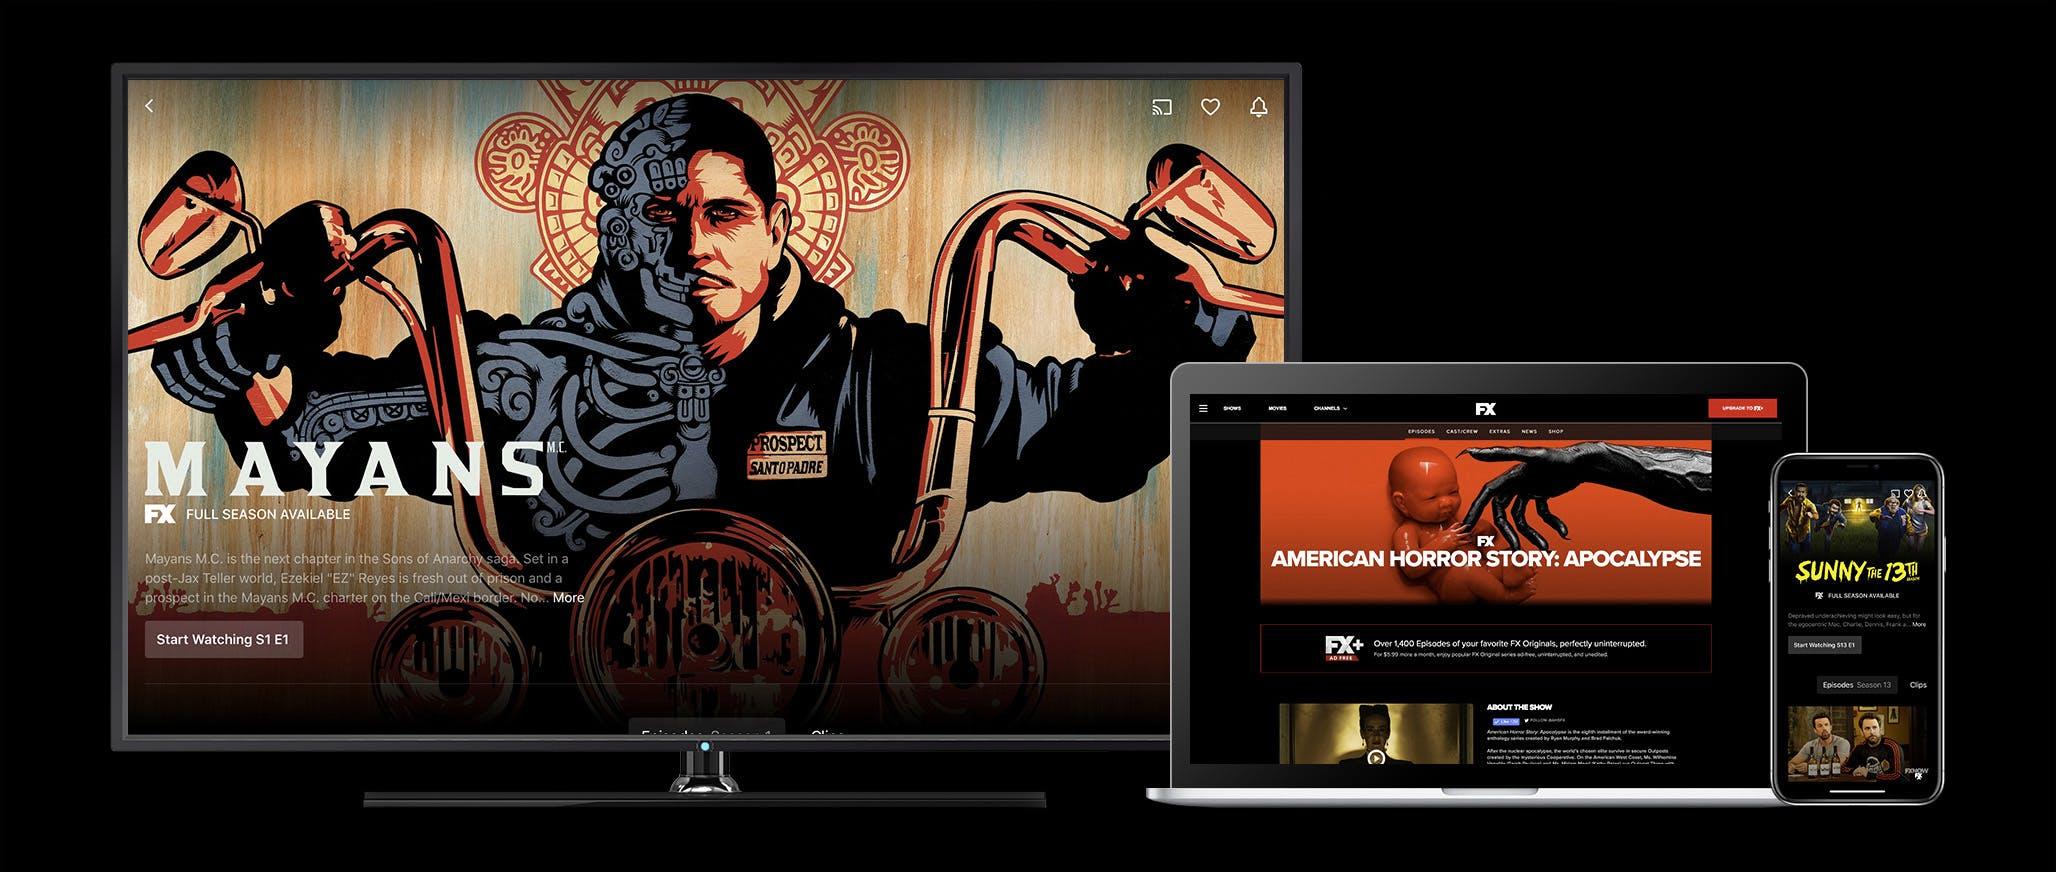 watch legion season 3 free on FX Now